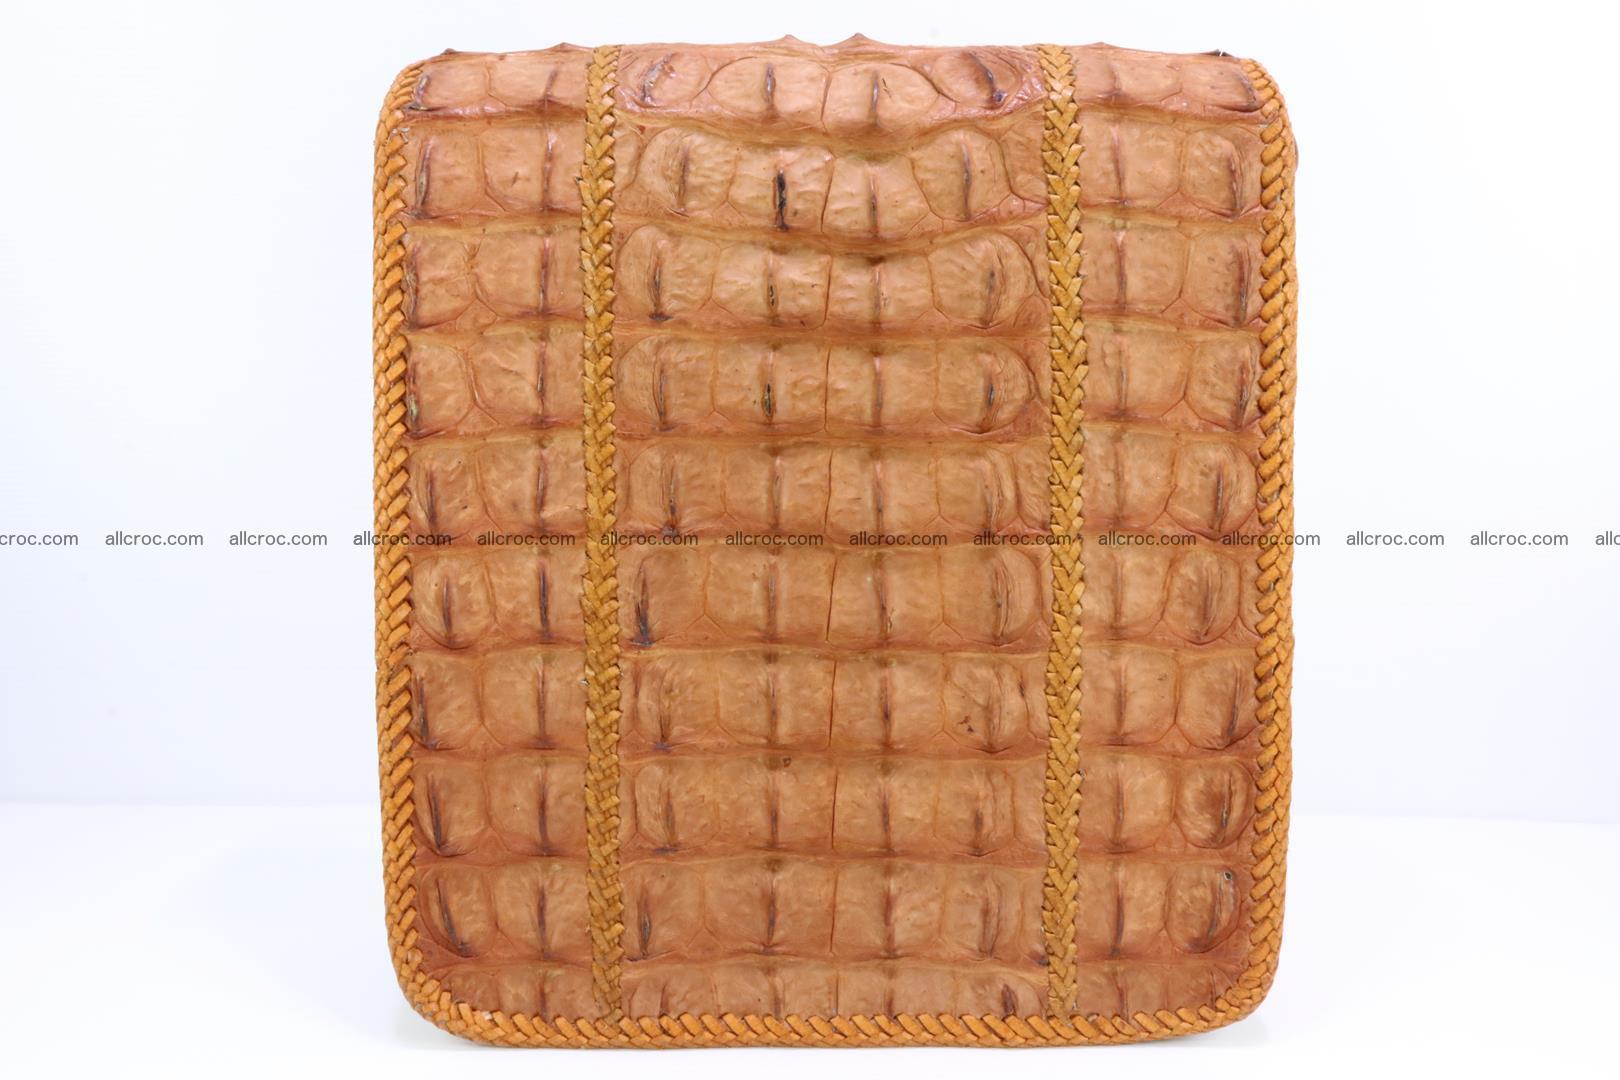 Сrocodile skin shoulder bag with braided edges 141 Foto 3